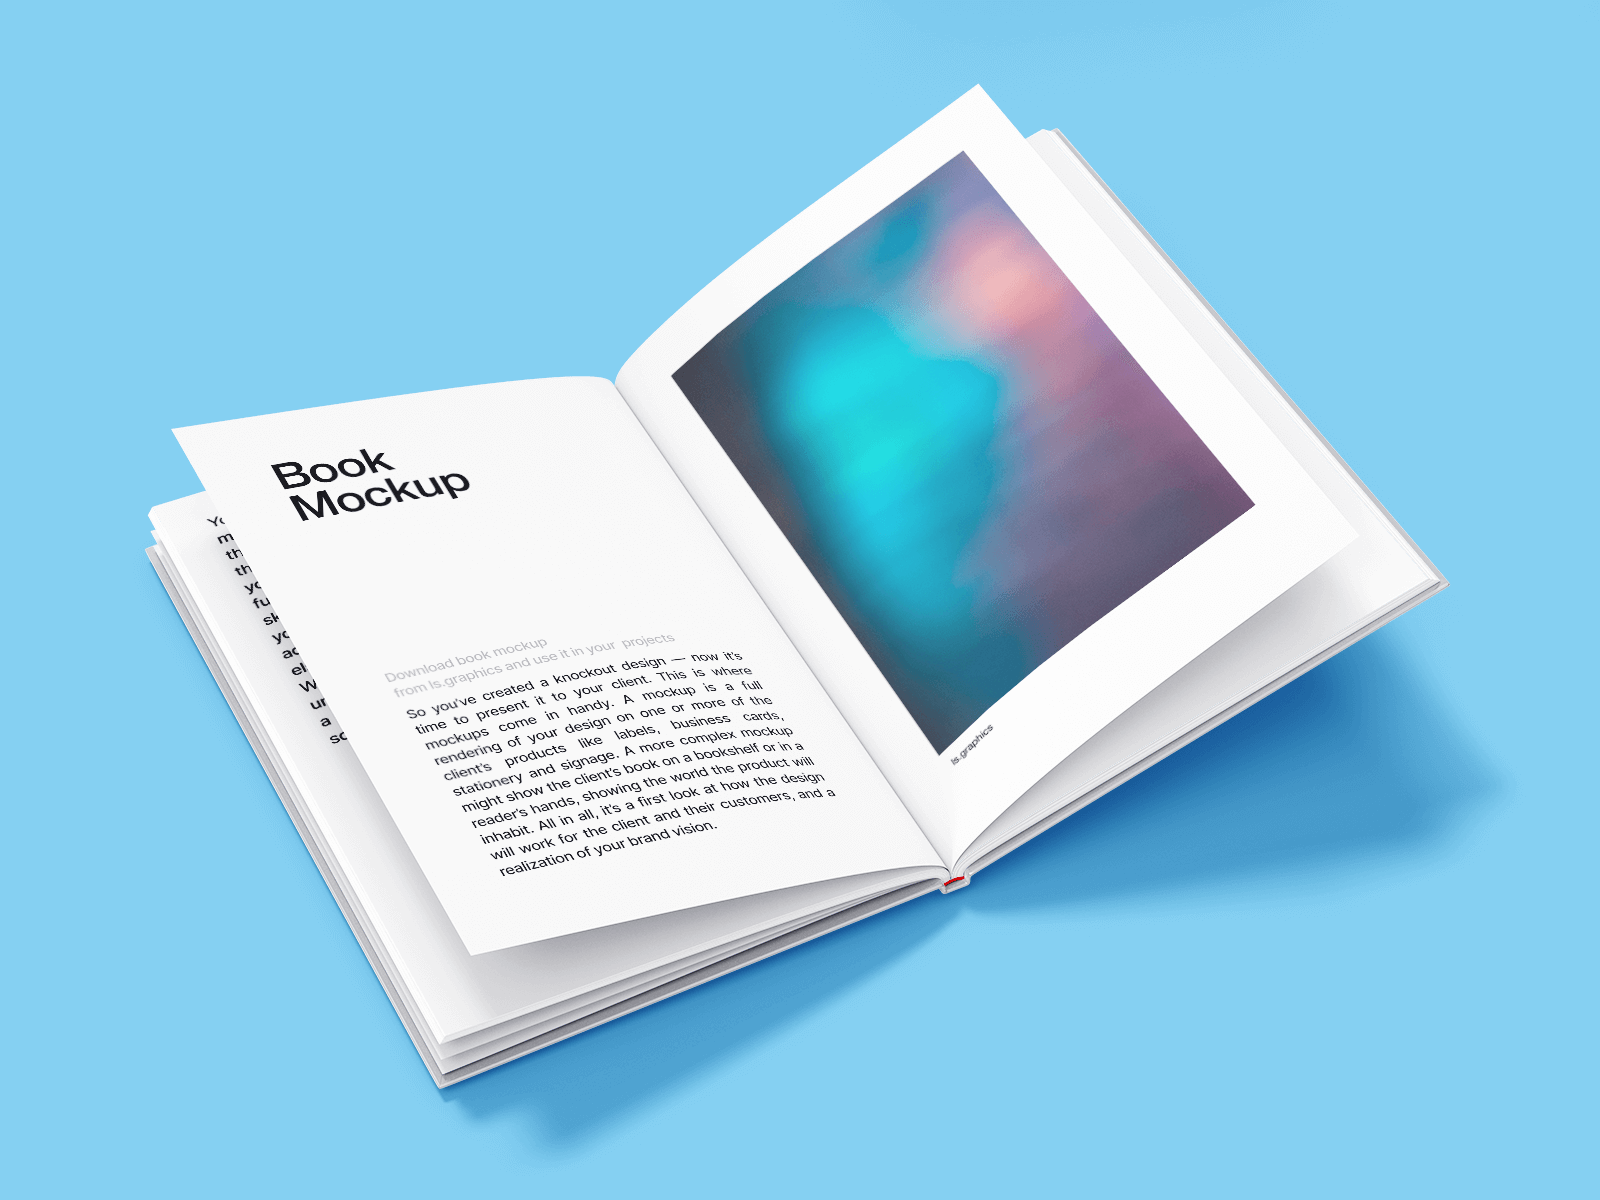 Free Open slim Hardcover Book Mockup